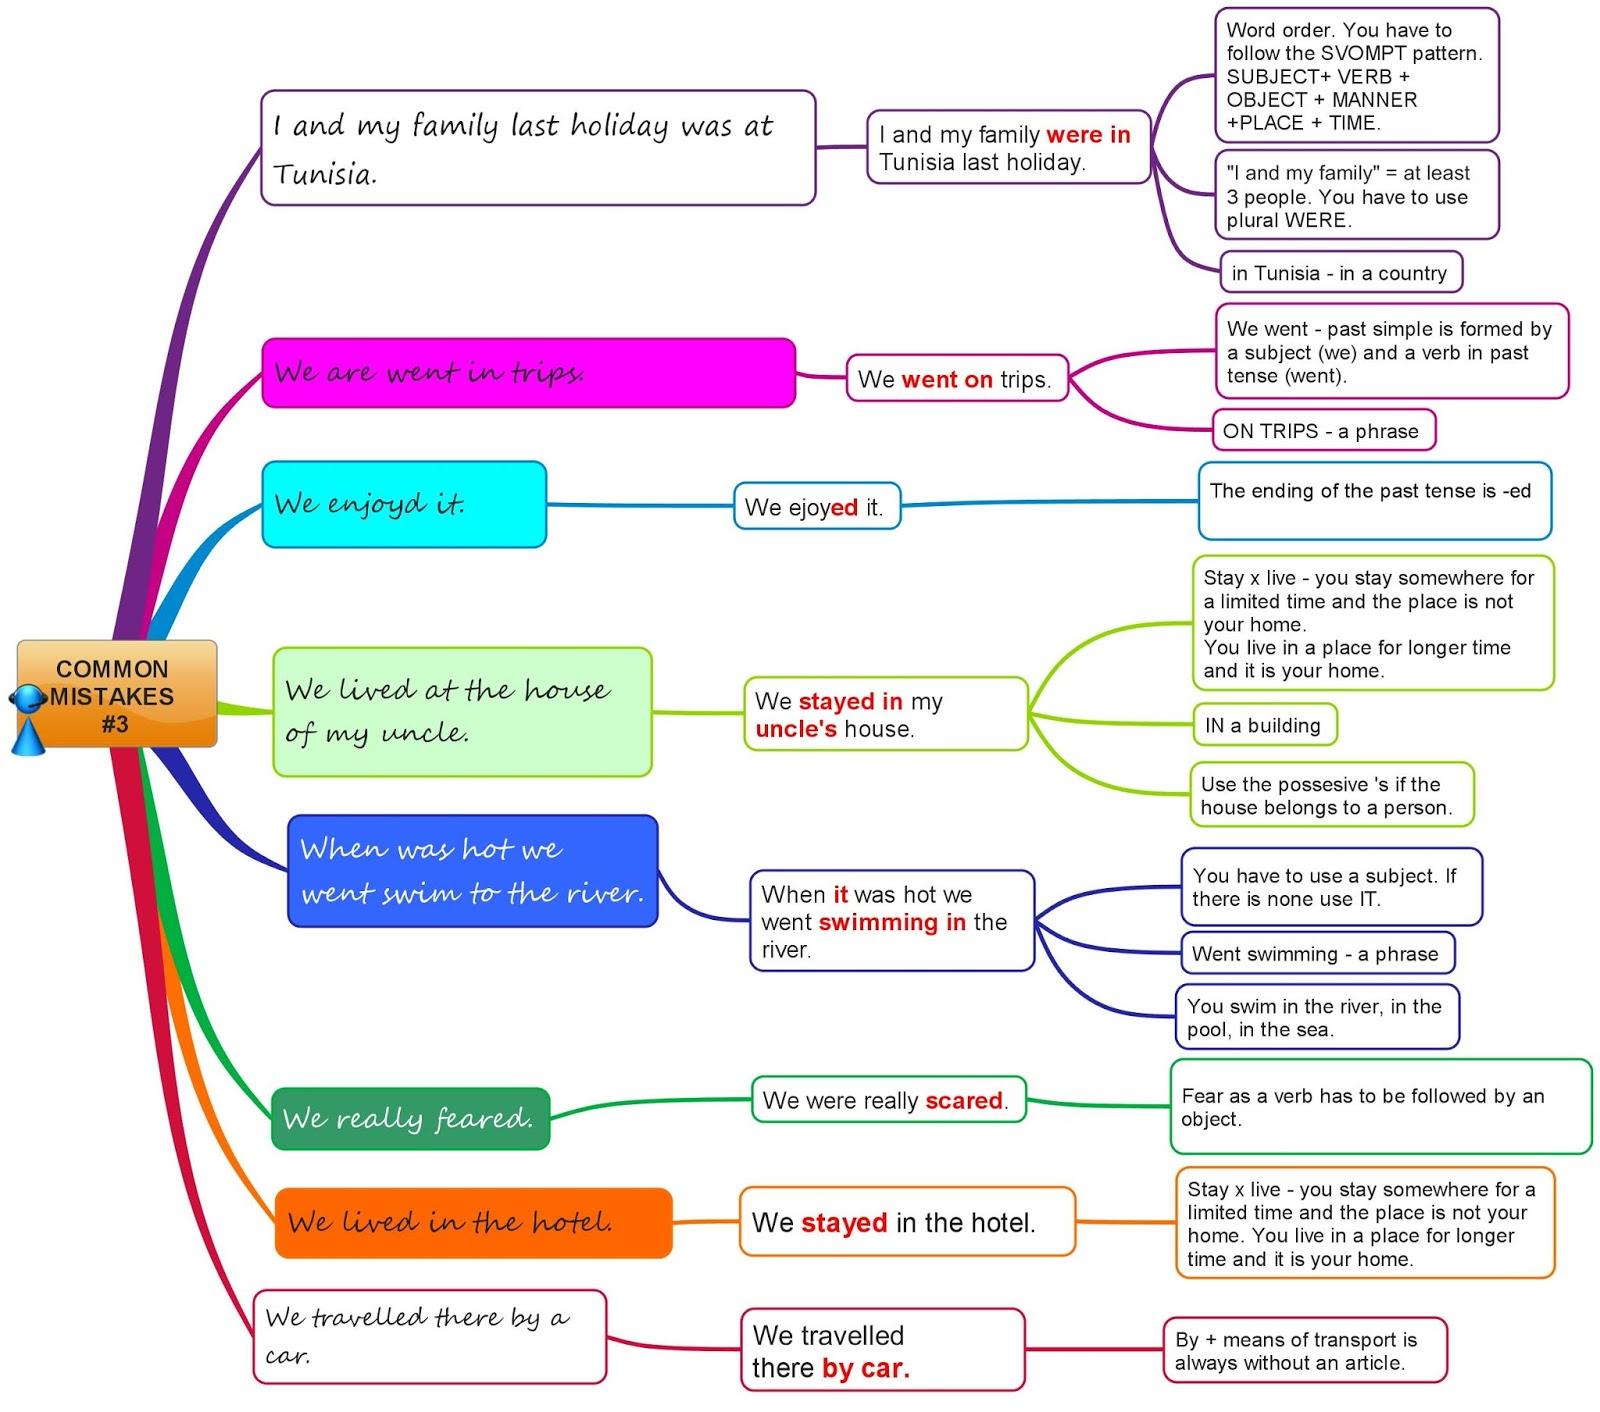 50 Journal Writing Prompts for Kids ⋆ JournalBuddies.com